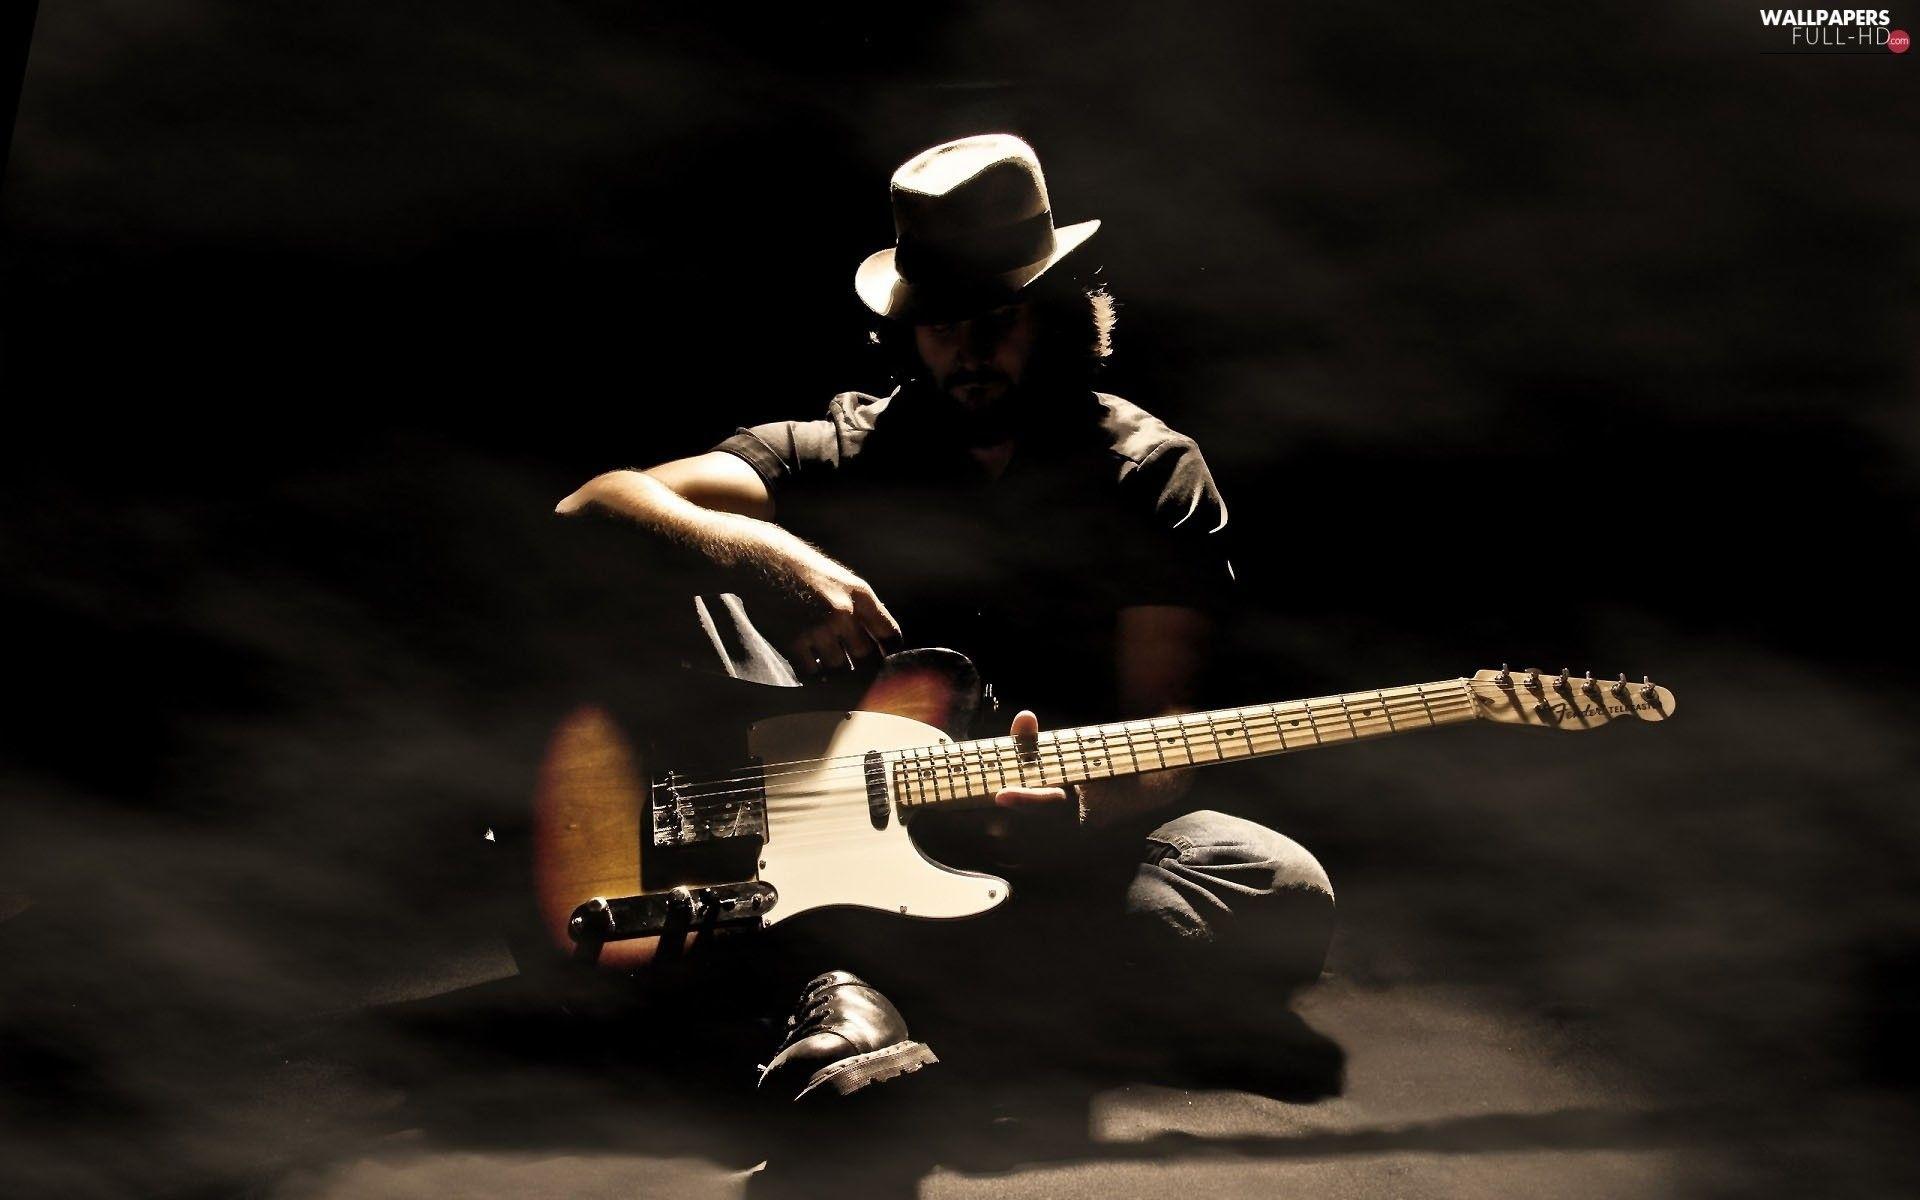 Martin Guitar Wallpaper Data Src Img 174658 Acoustic Guitar Wallpaper Hd 1920x1200 Wallpaper Teahub Io